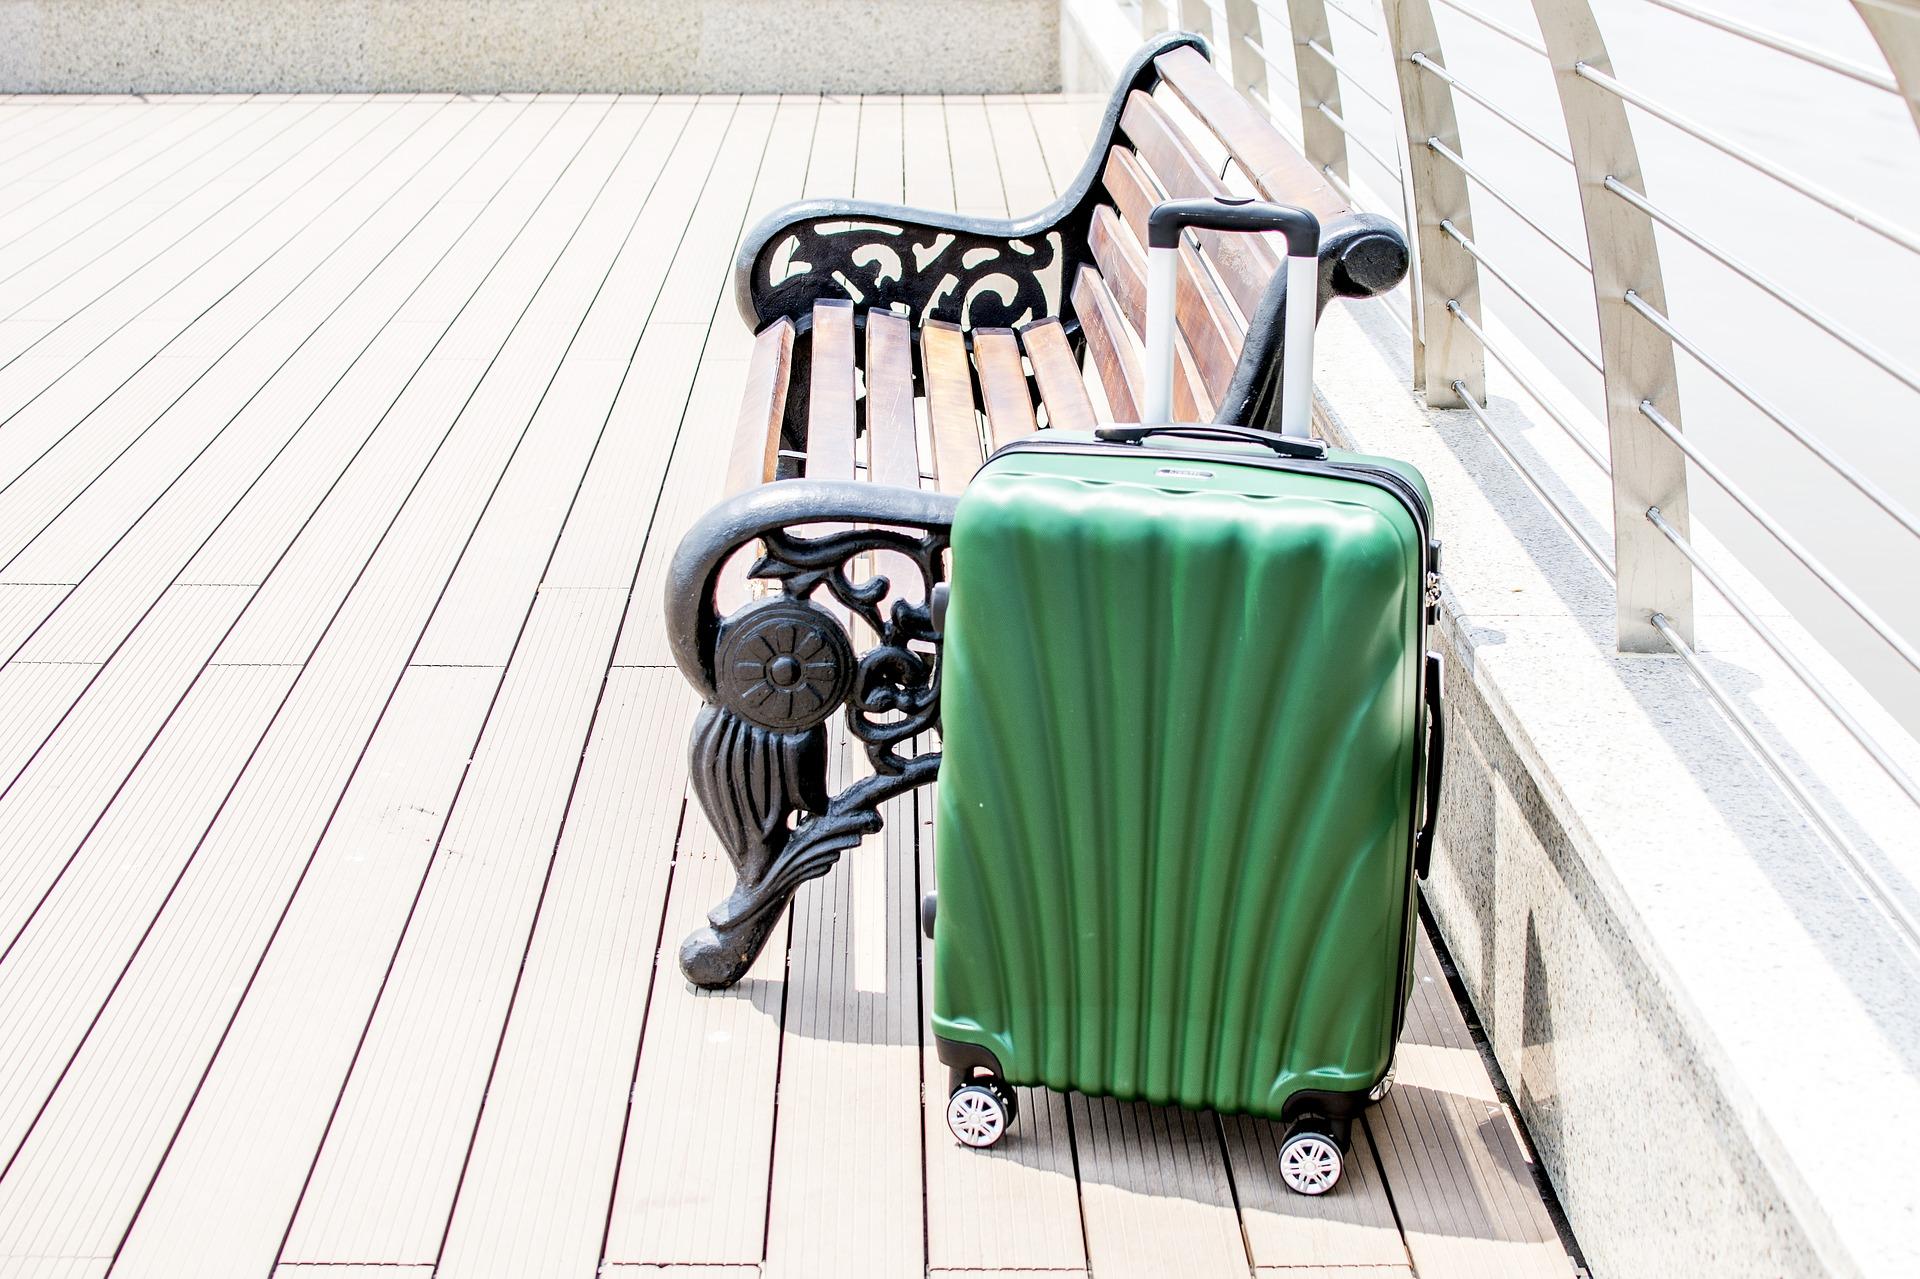 Mižnarodnyj aeroport «Boryspiľ» zapustyv virtuaľnogo šukača bagažu